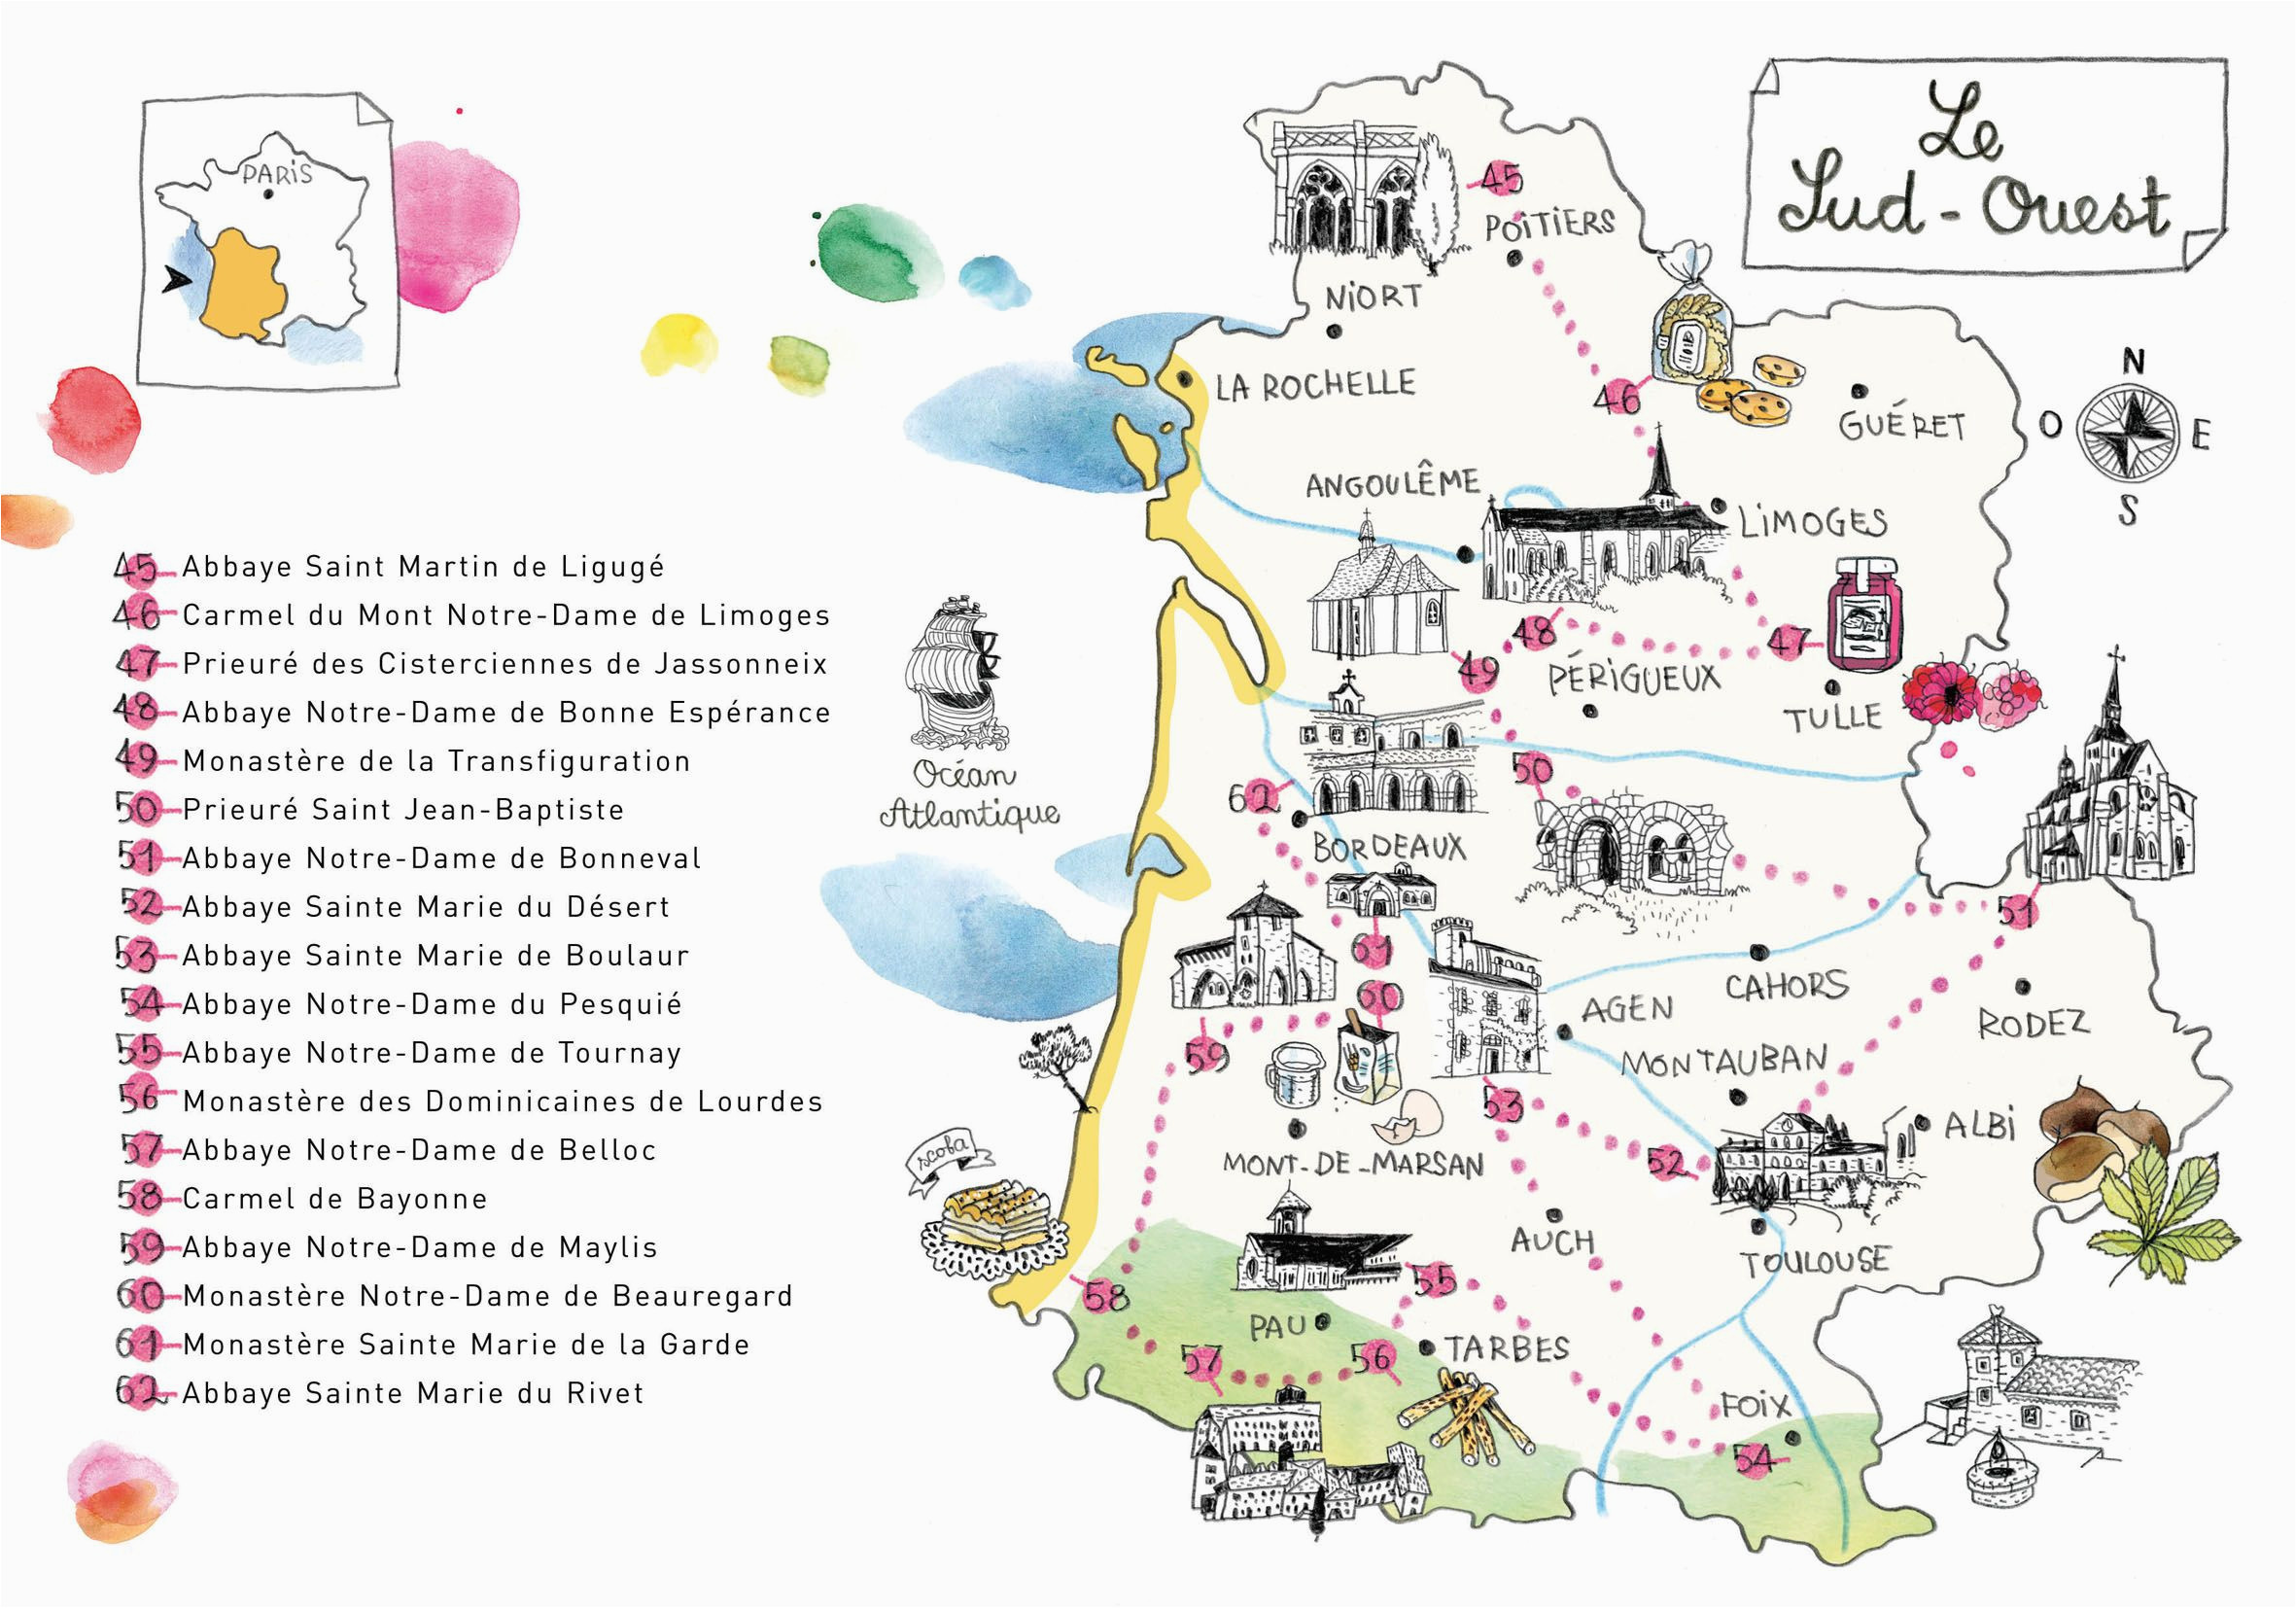 caroline donadieu guide des abbayes south west france